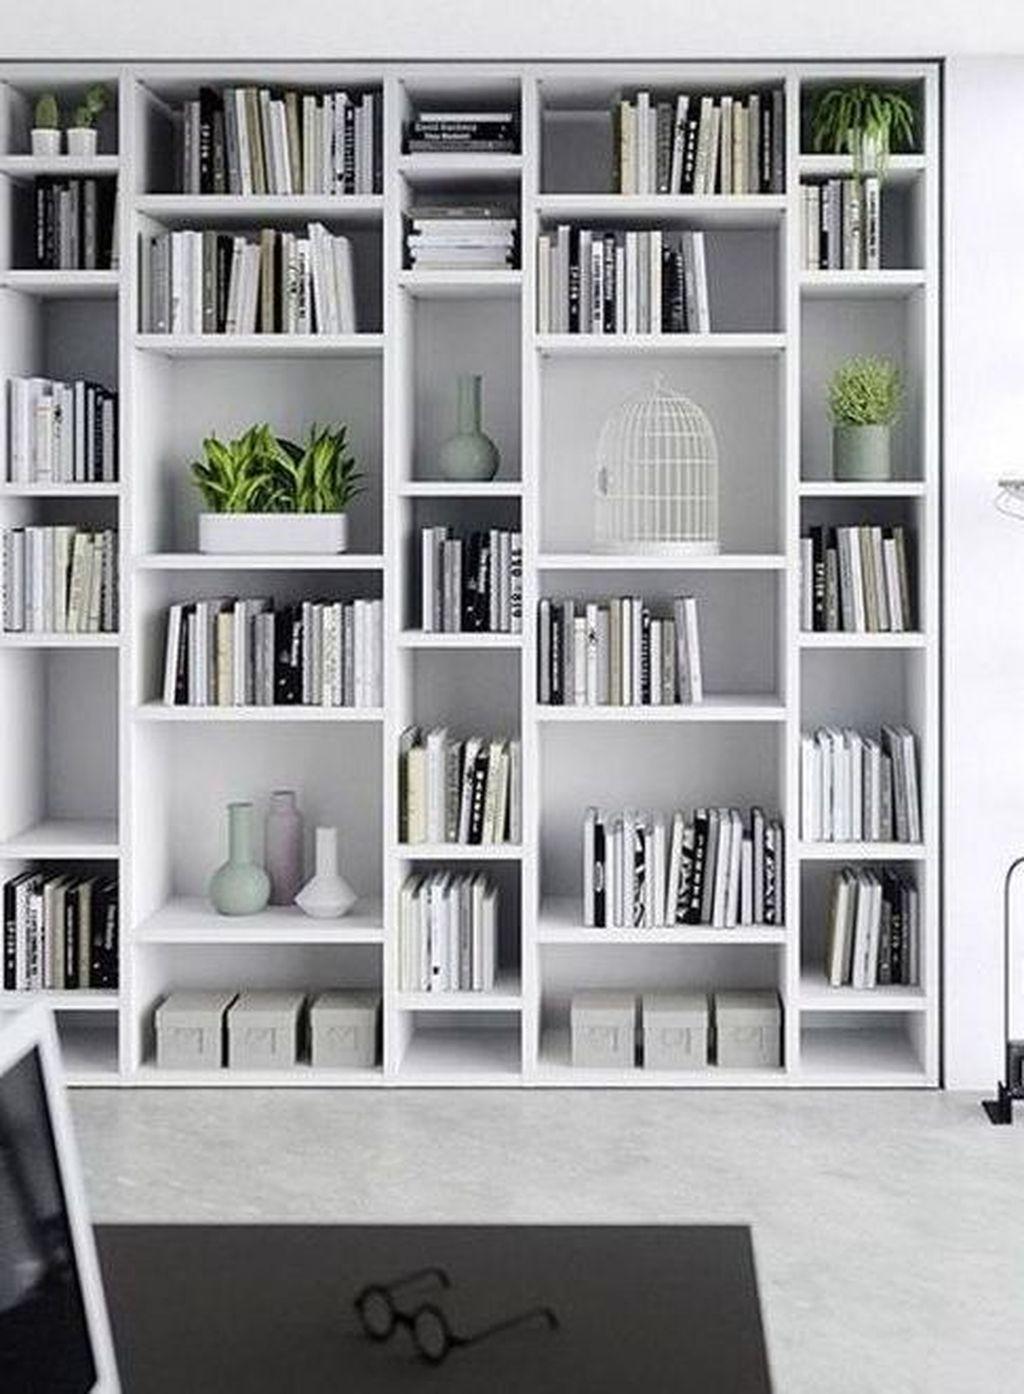 Living Room Library Design Ideas: 32 Stunning Bookshelf Design Ideas For A Minimalist Home